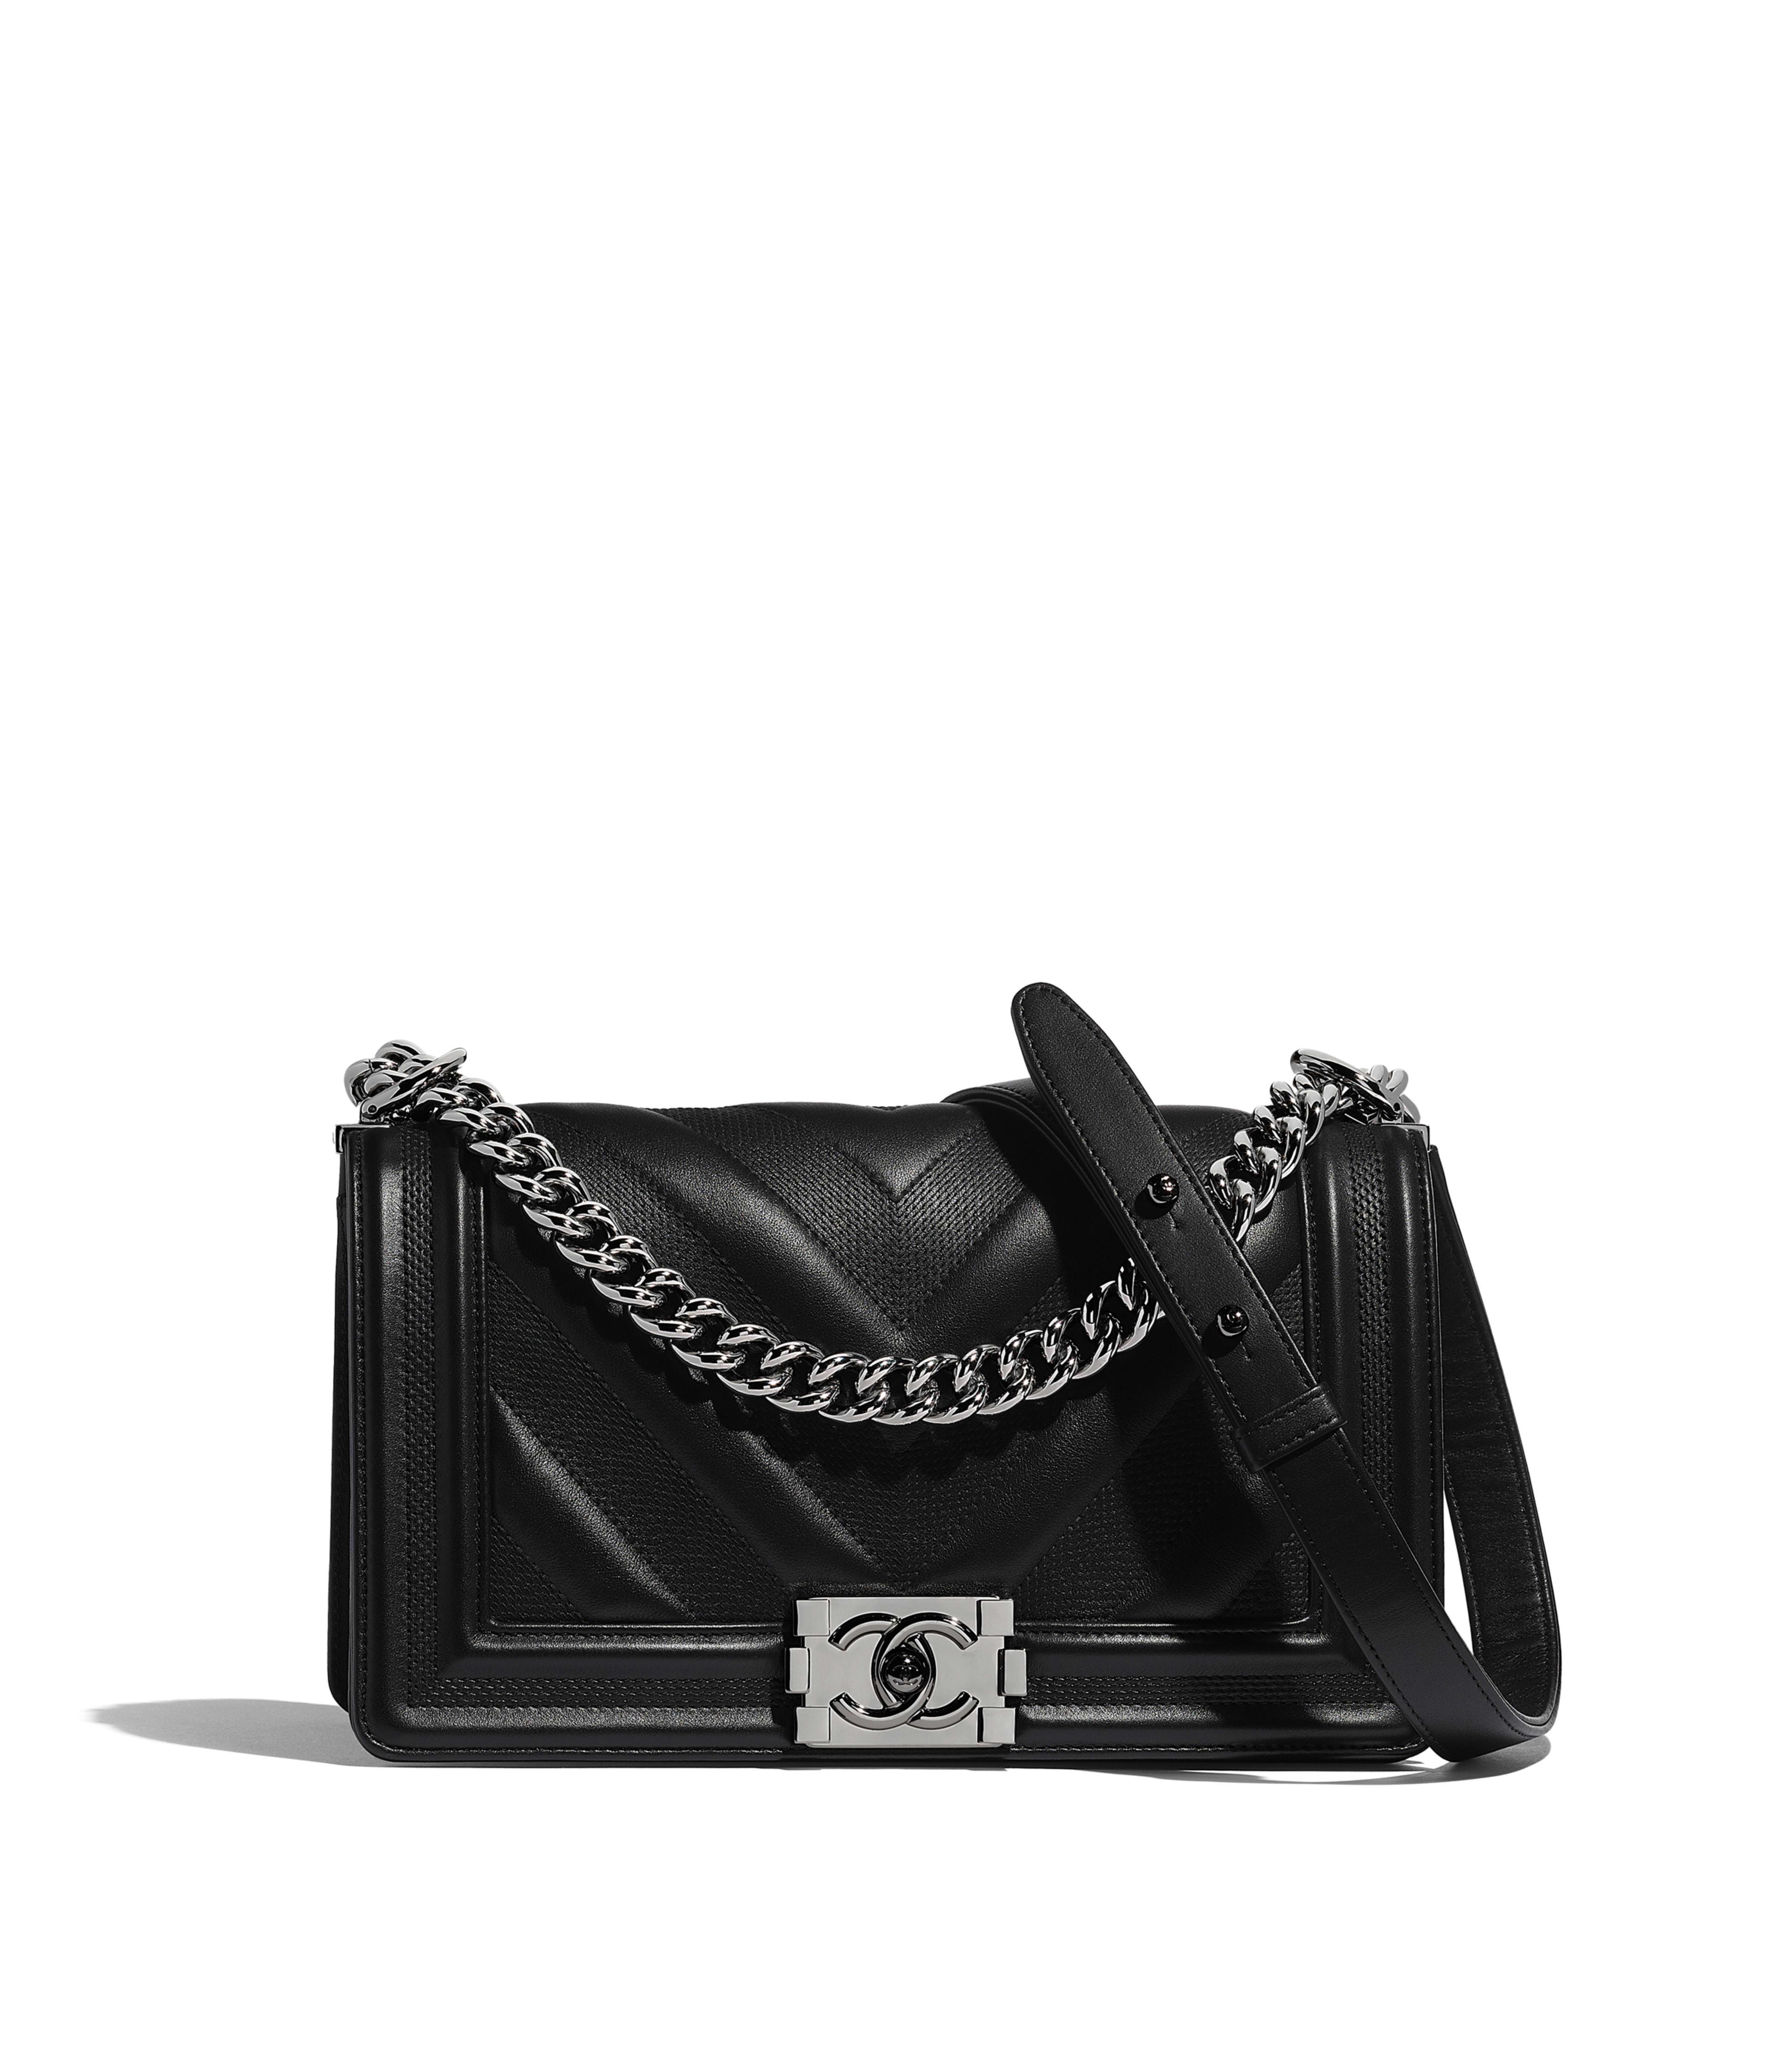 f1b8285e BOY CHANEL - Handbags | CHANEL